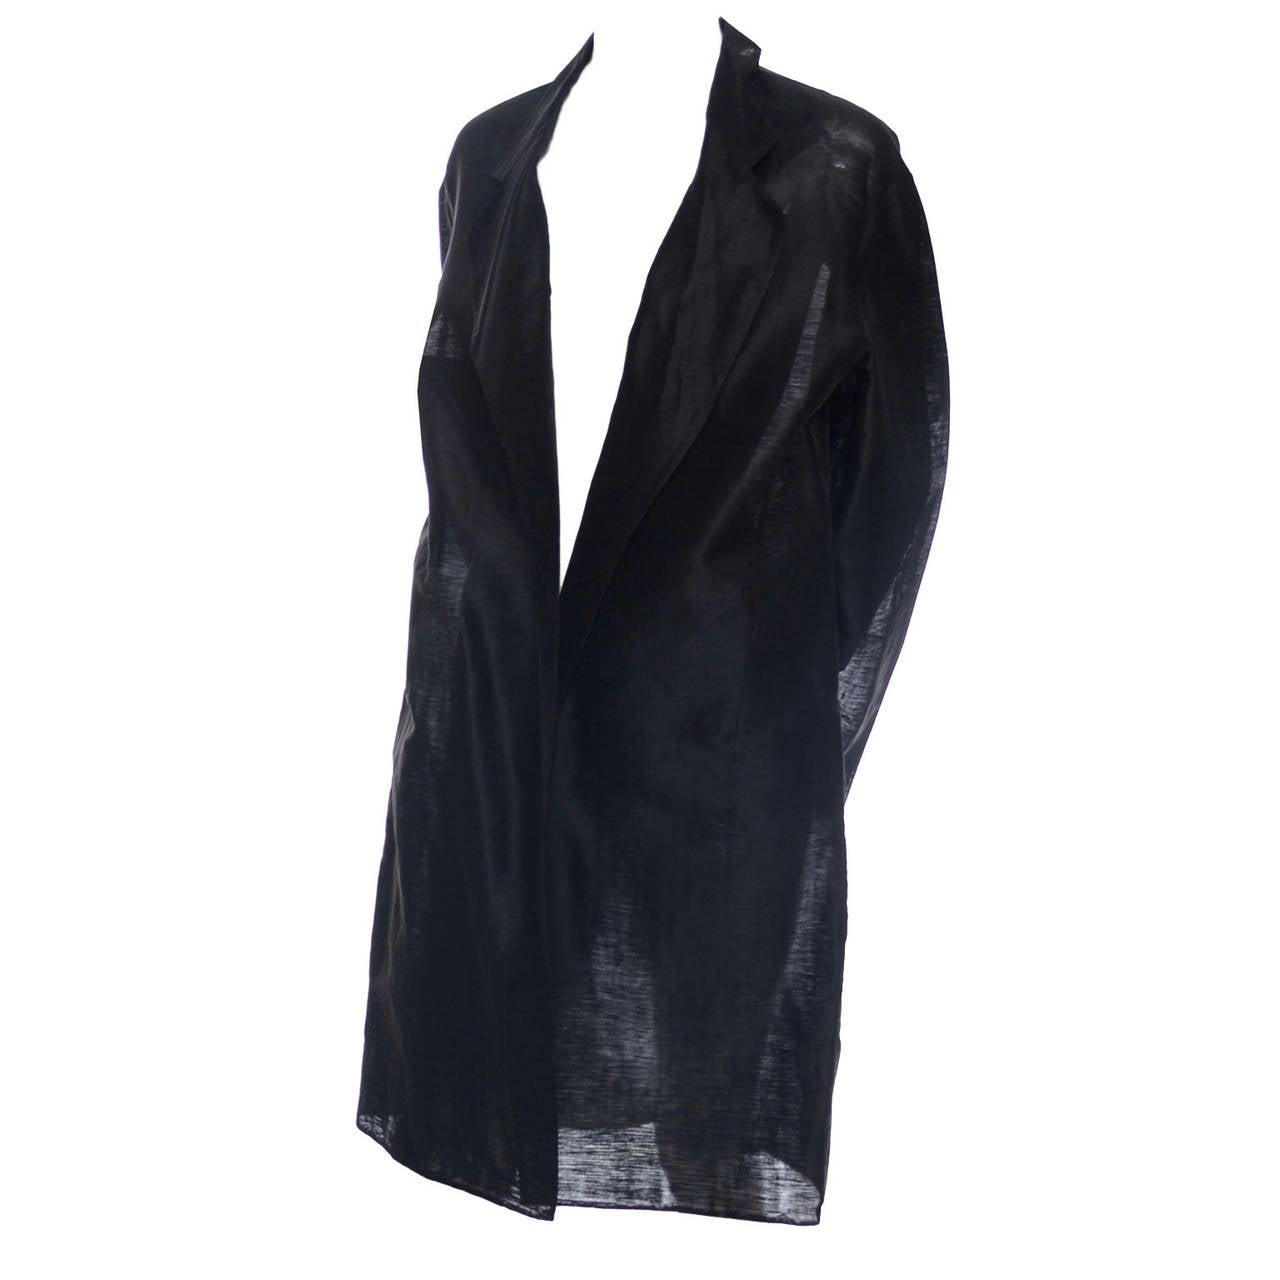 Donna Karan New York Black Label Linen Organza Evening Coat Semi Sheer